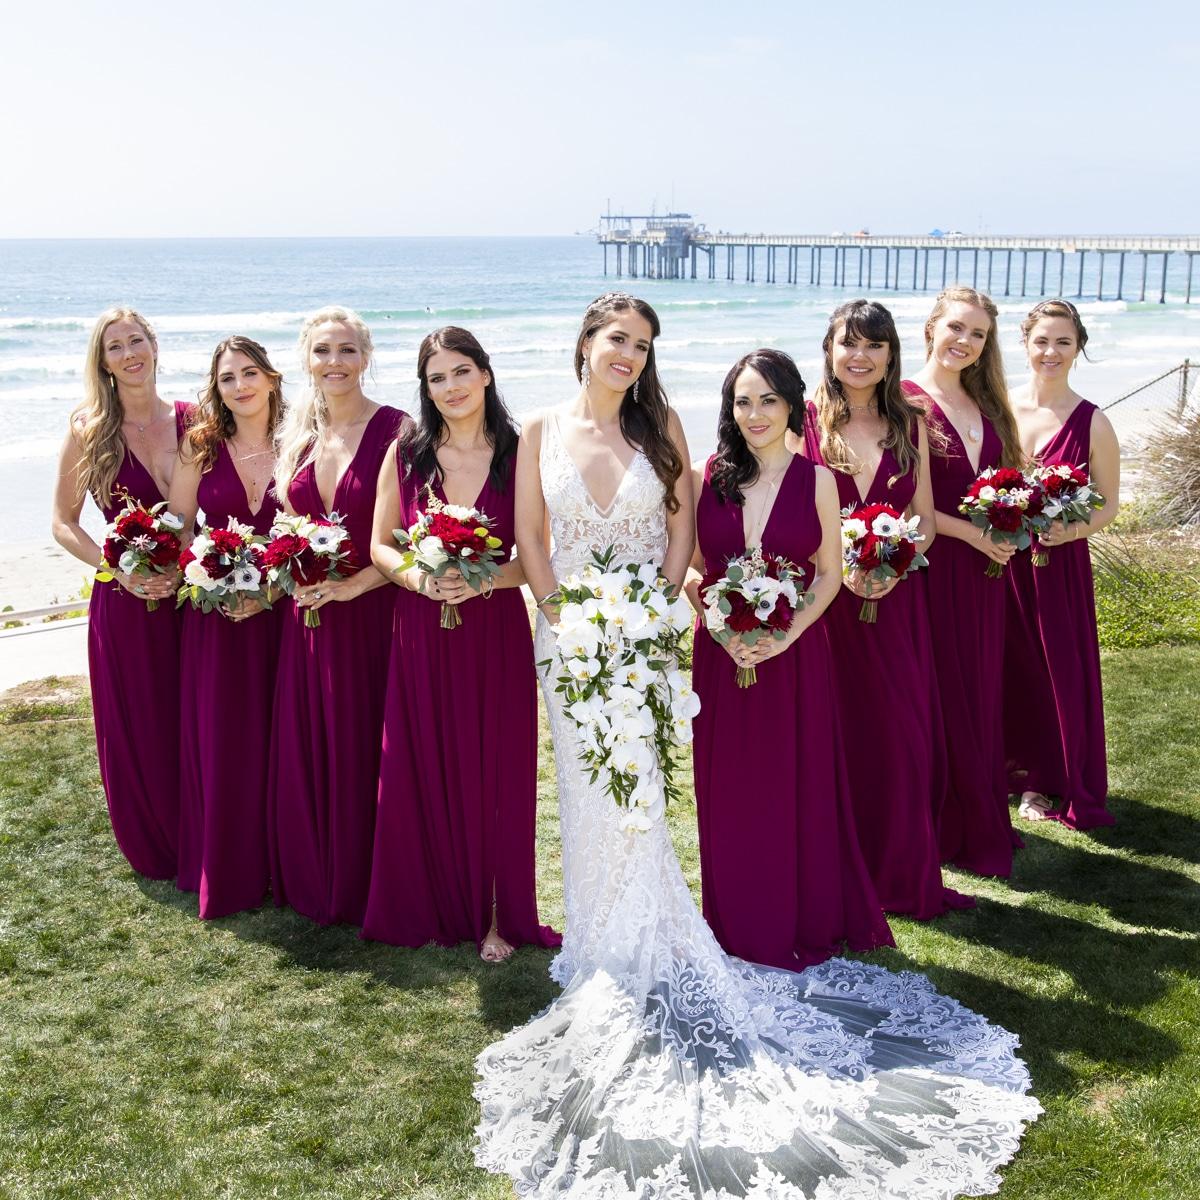 scripps-seaside-forum-wedding-33